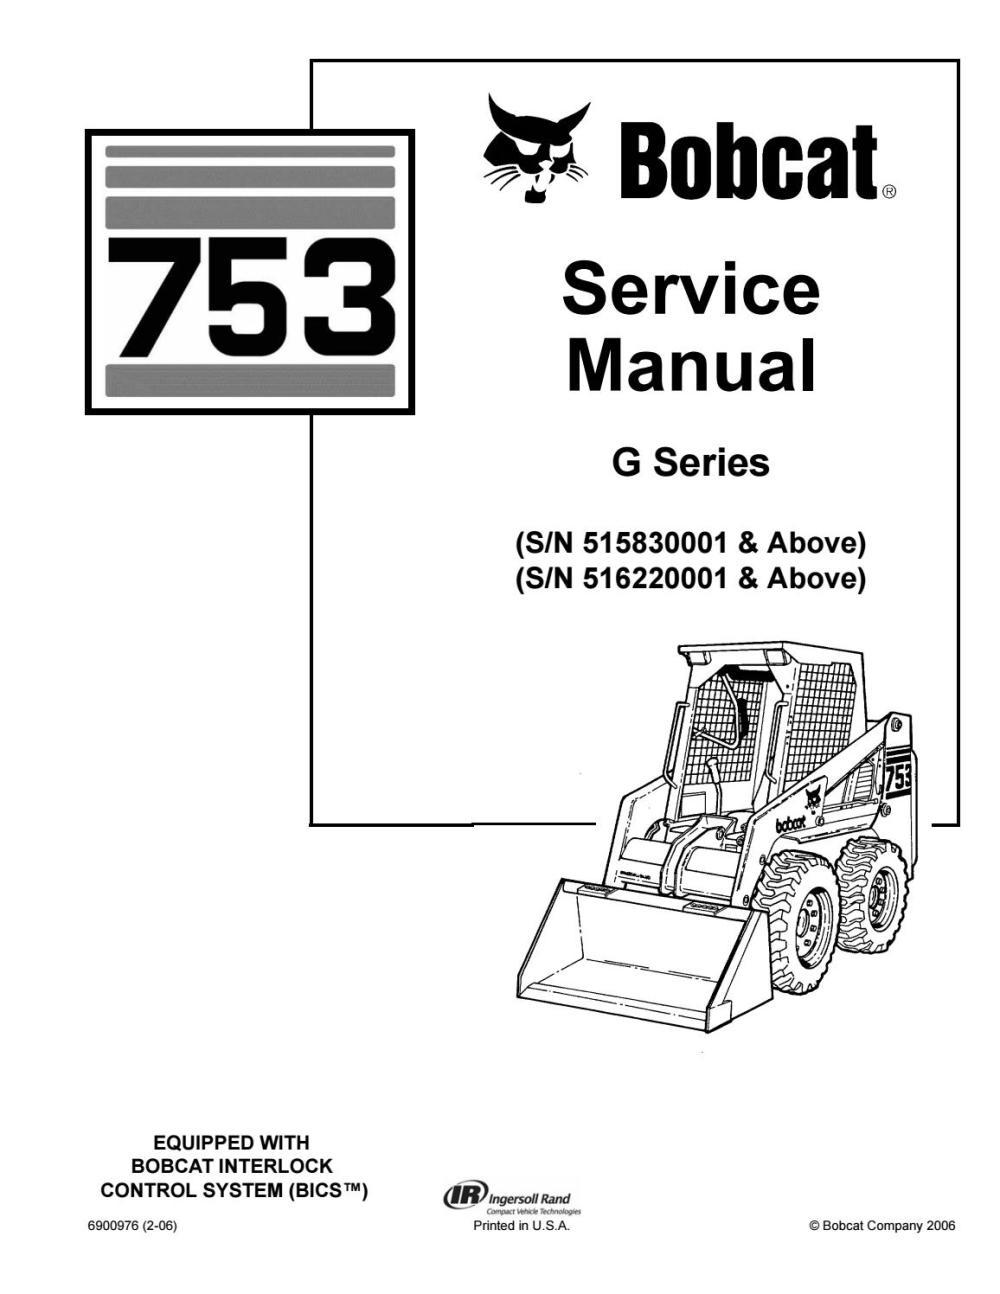 medium resolution of bobcat 753 skid steer loader service repair manual sn 515830001 above sn 516220001 above by ujfjisefjj issuu